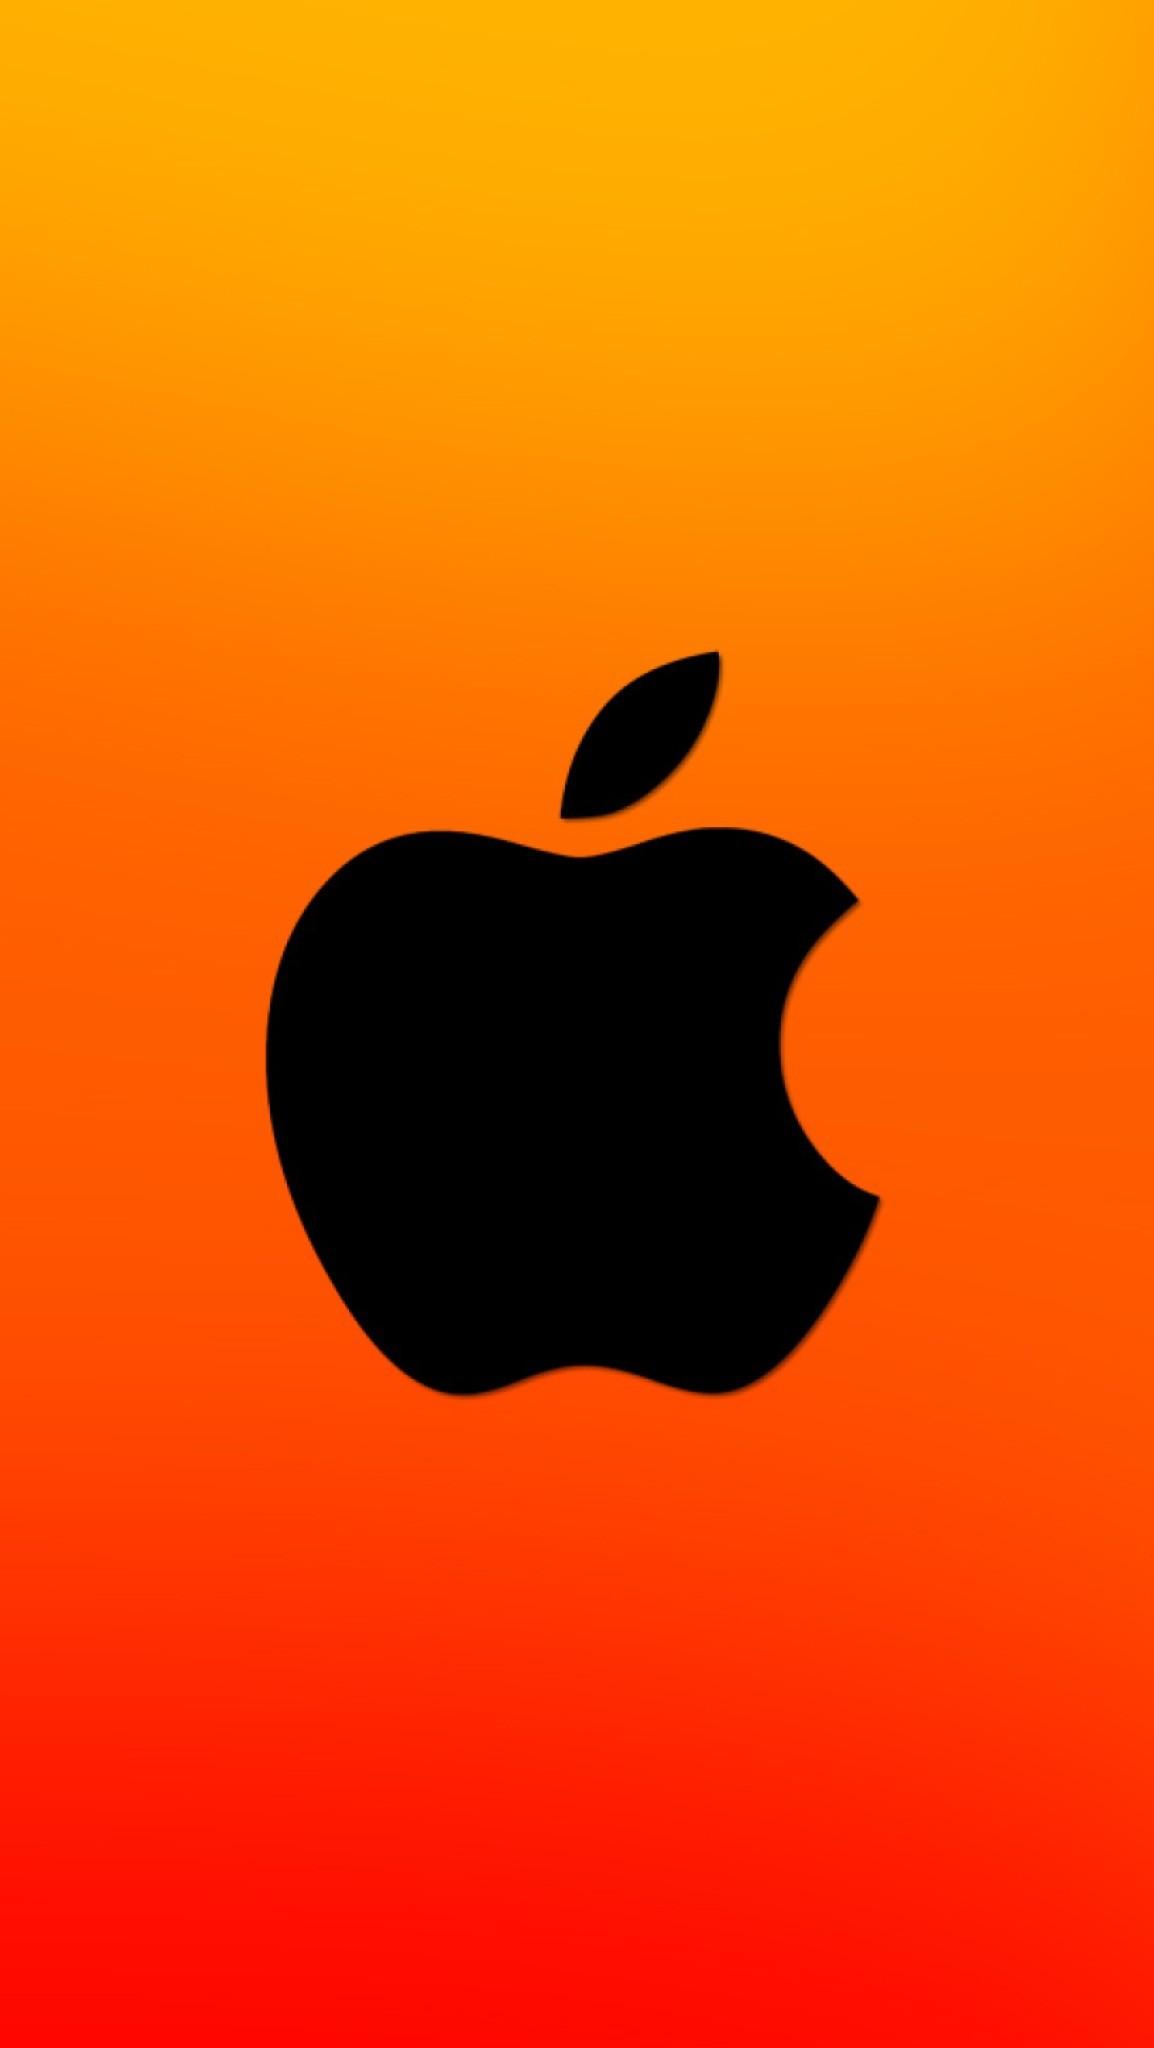 Ipad Air Apple Wallpaper - Apple Logo Hd Wallpaper For Iphone 6 , HD Wallpaper & Backgrounds